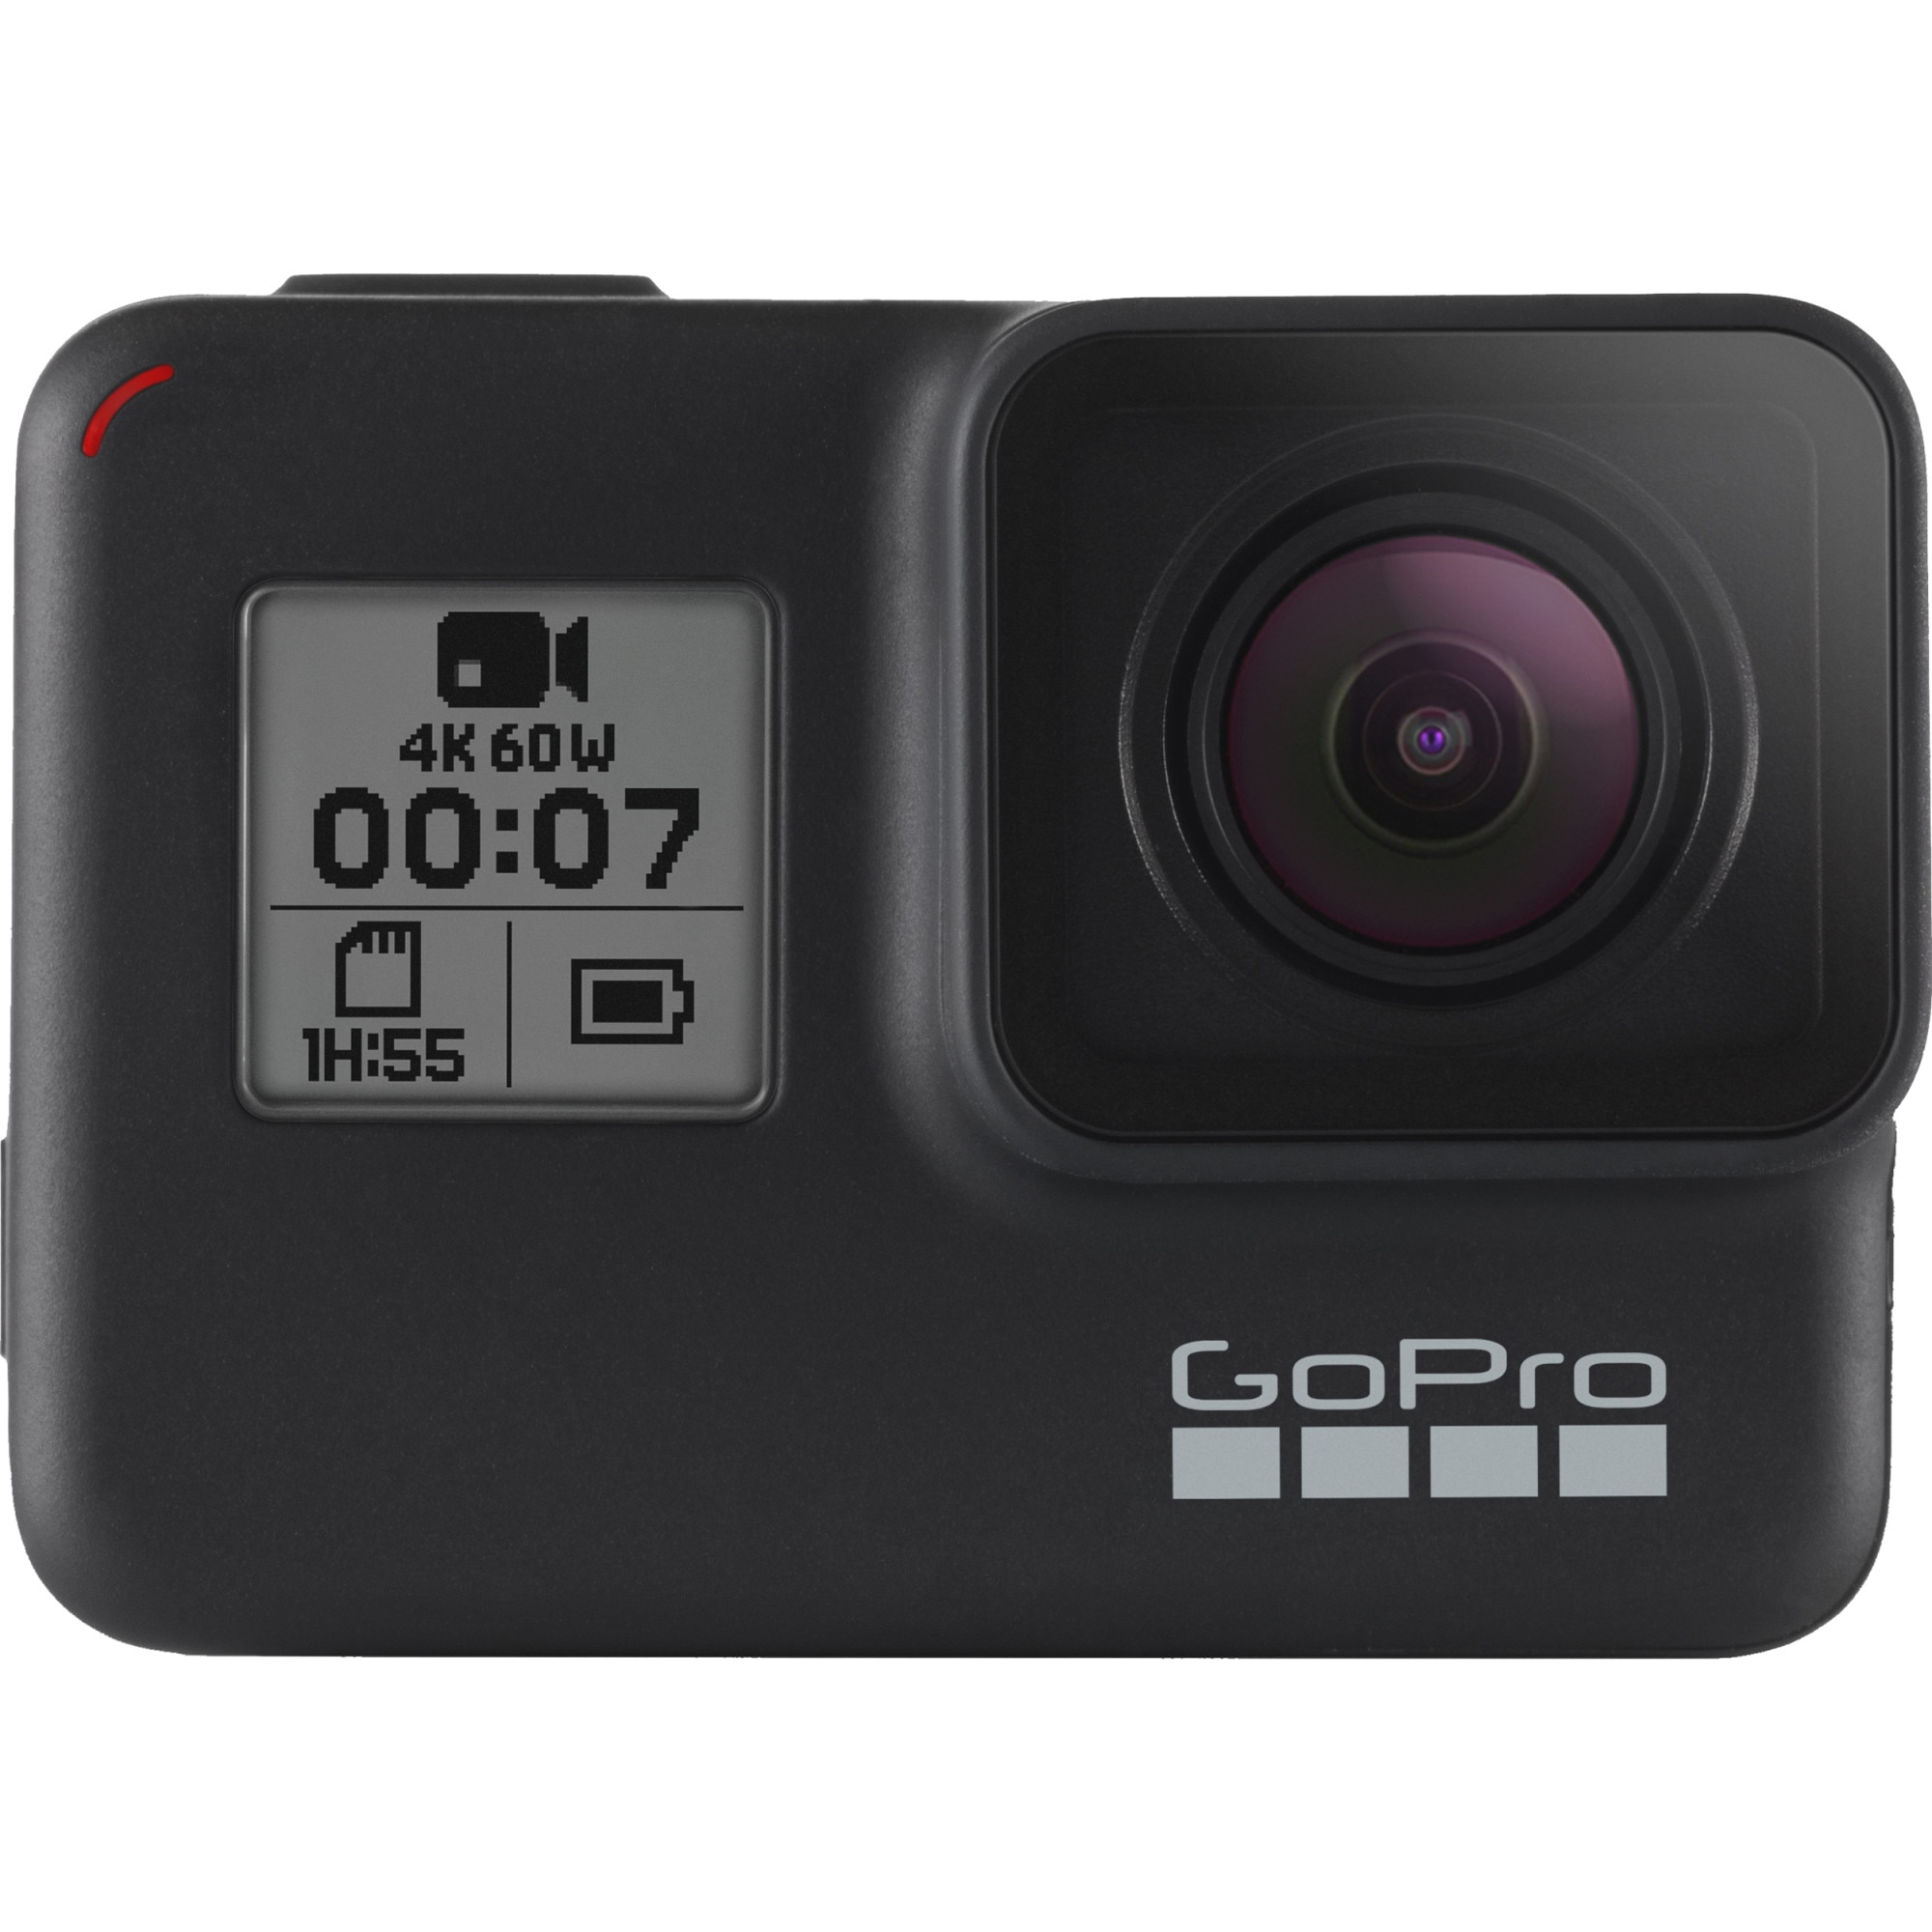 Fotografie Camera video sport GoPro HERO7, 4K, GPS, Black Edition